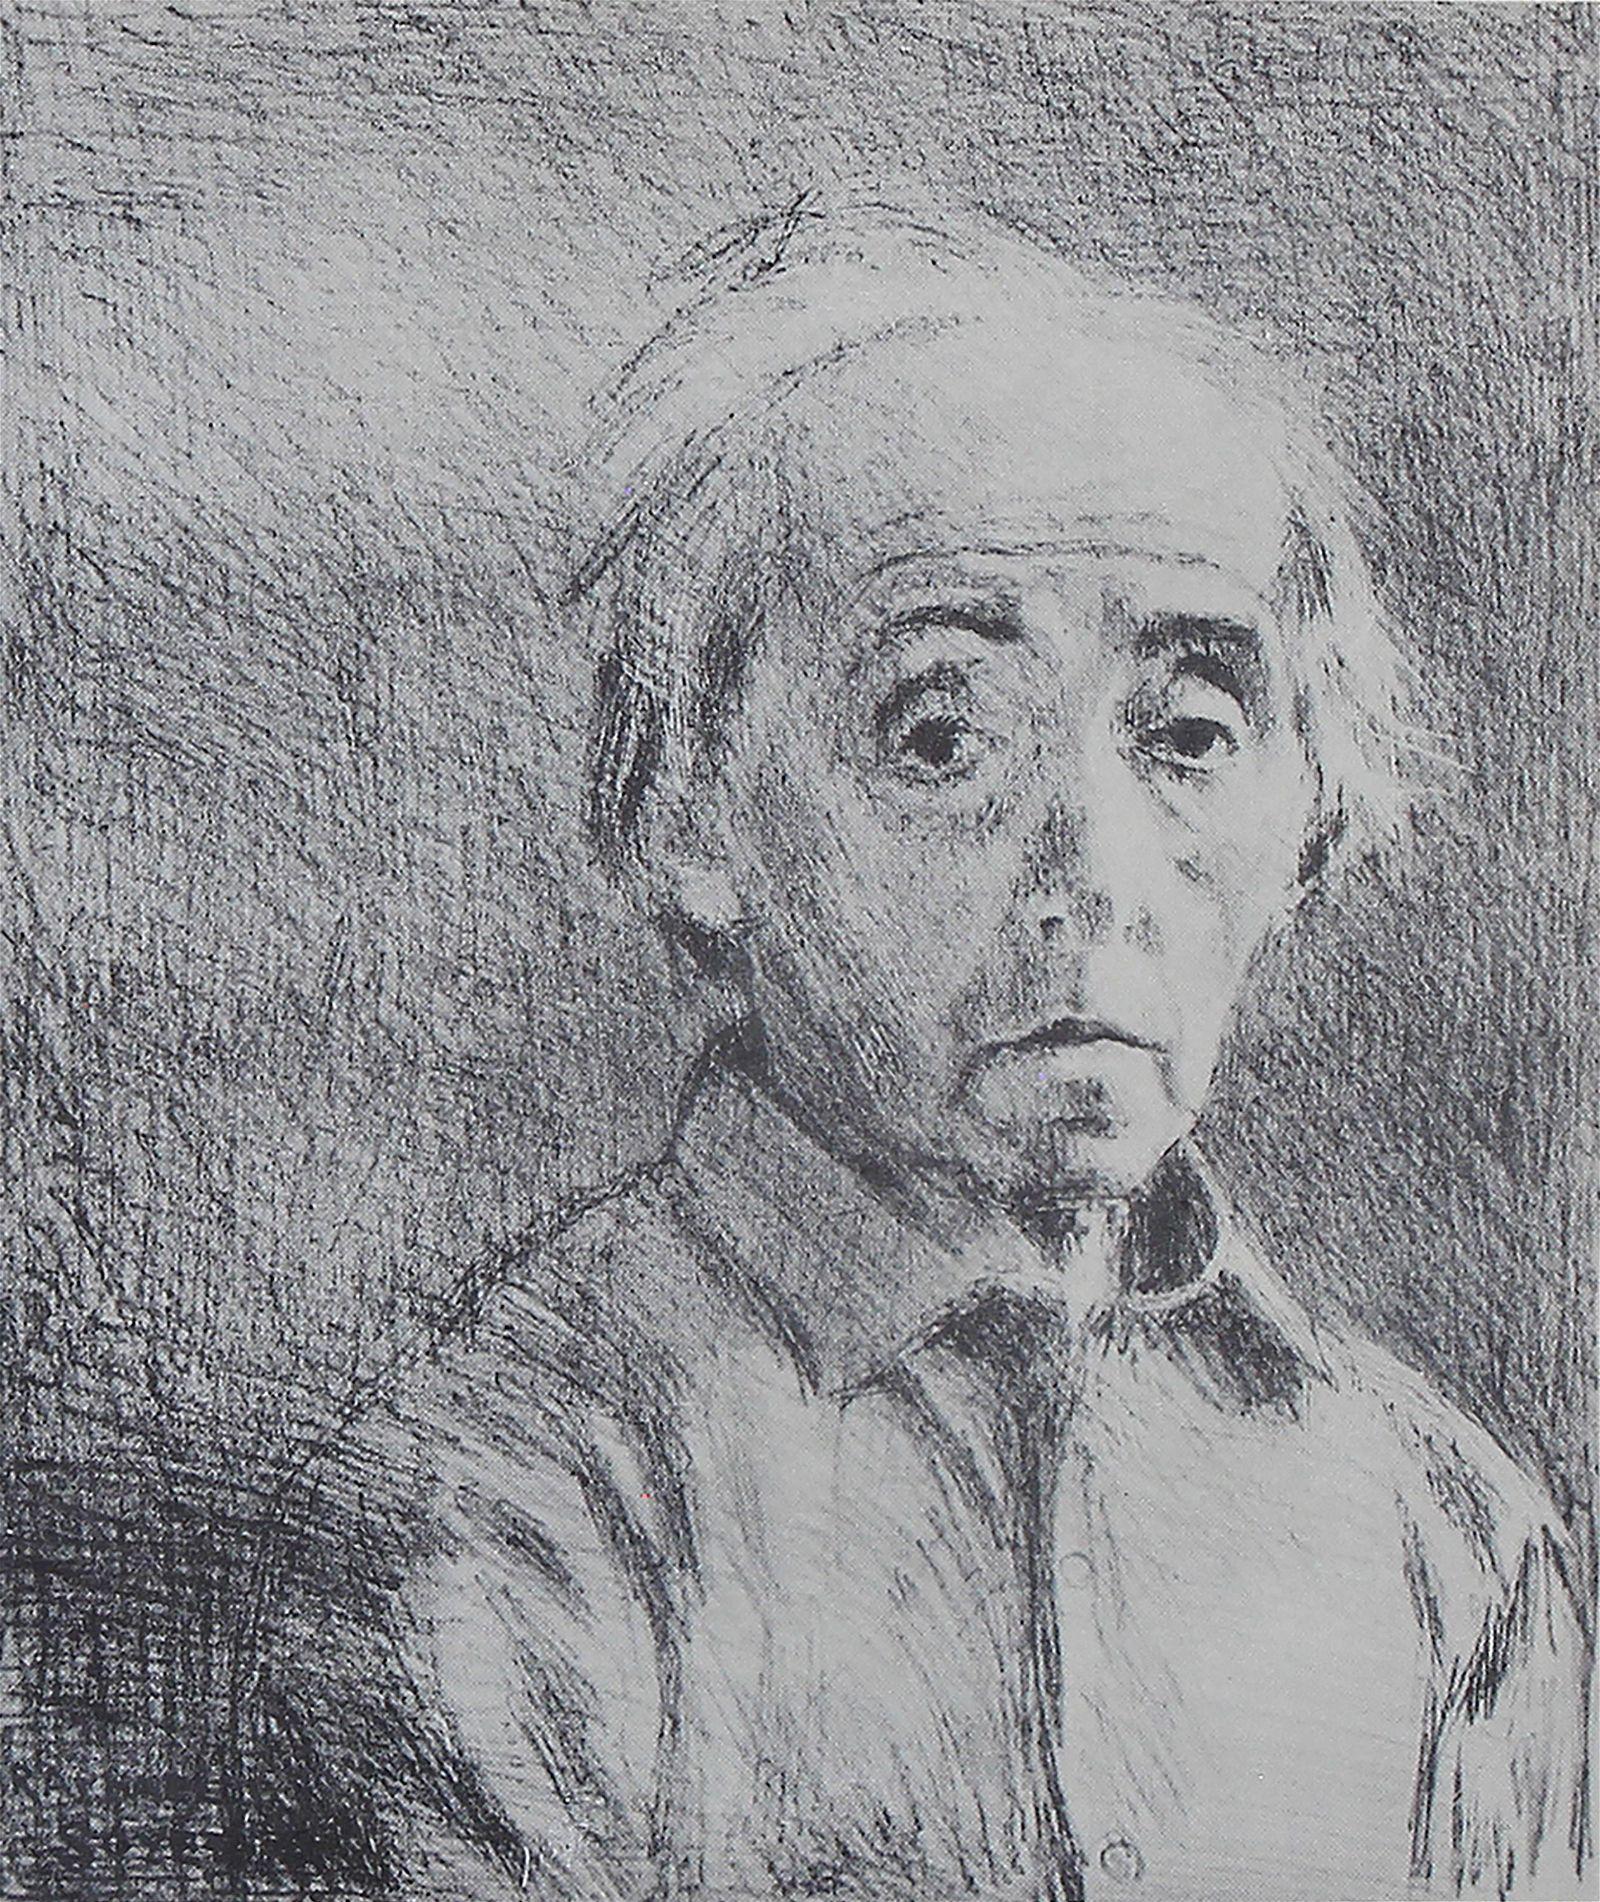 Raphael Soyer, Self Portrait